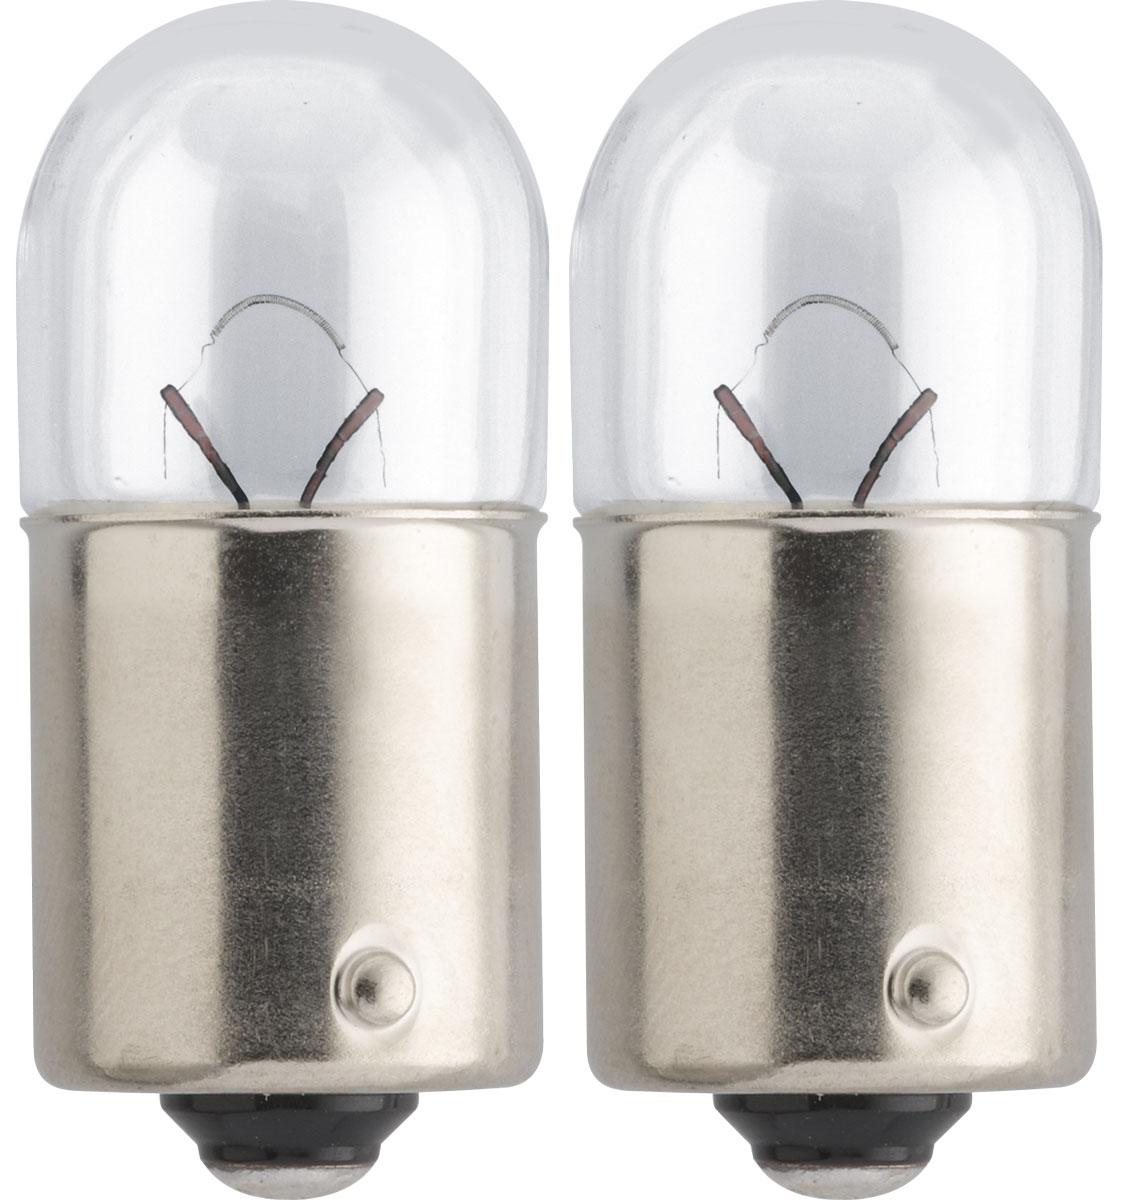 Автомобильная лампа накаливания Philips R5W 24V-5W (BA15s) (2шт.) 13821B2